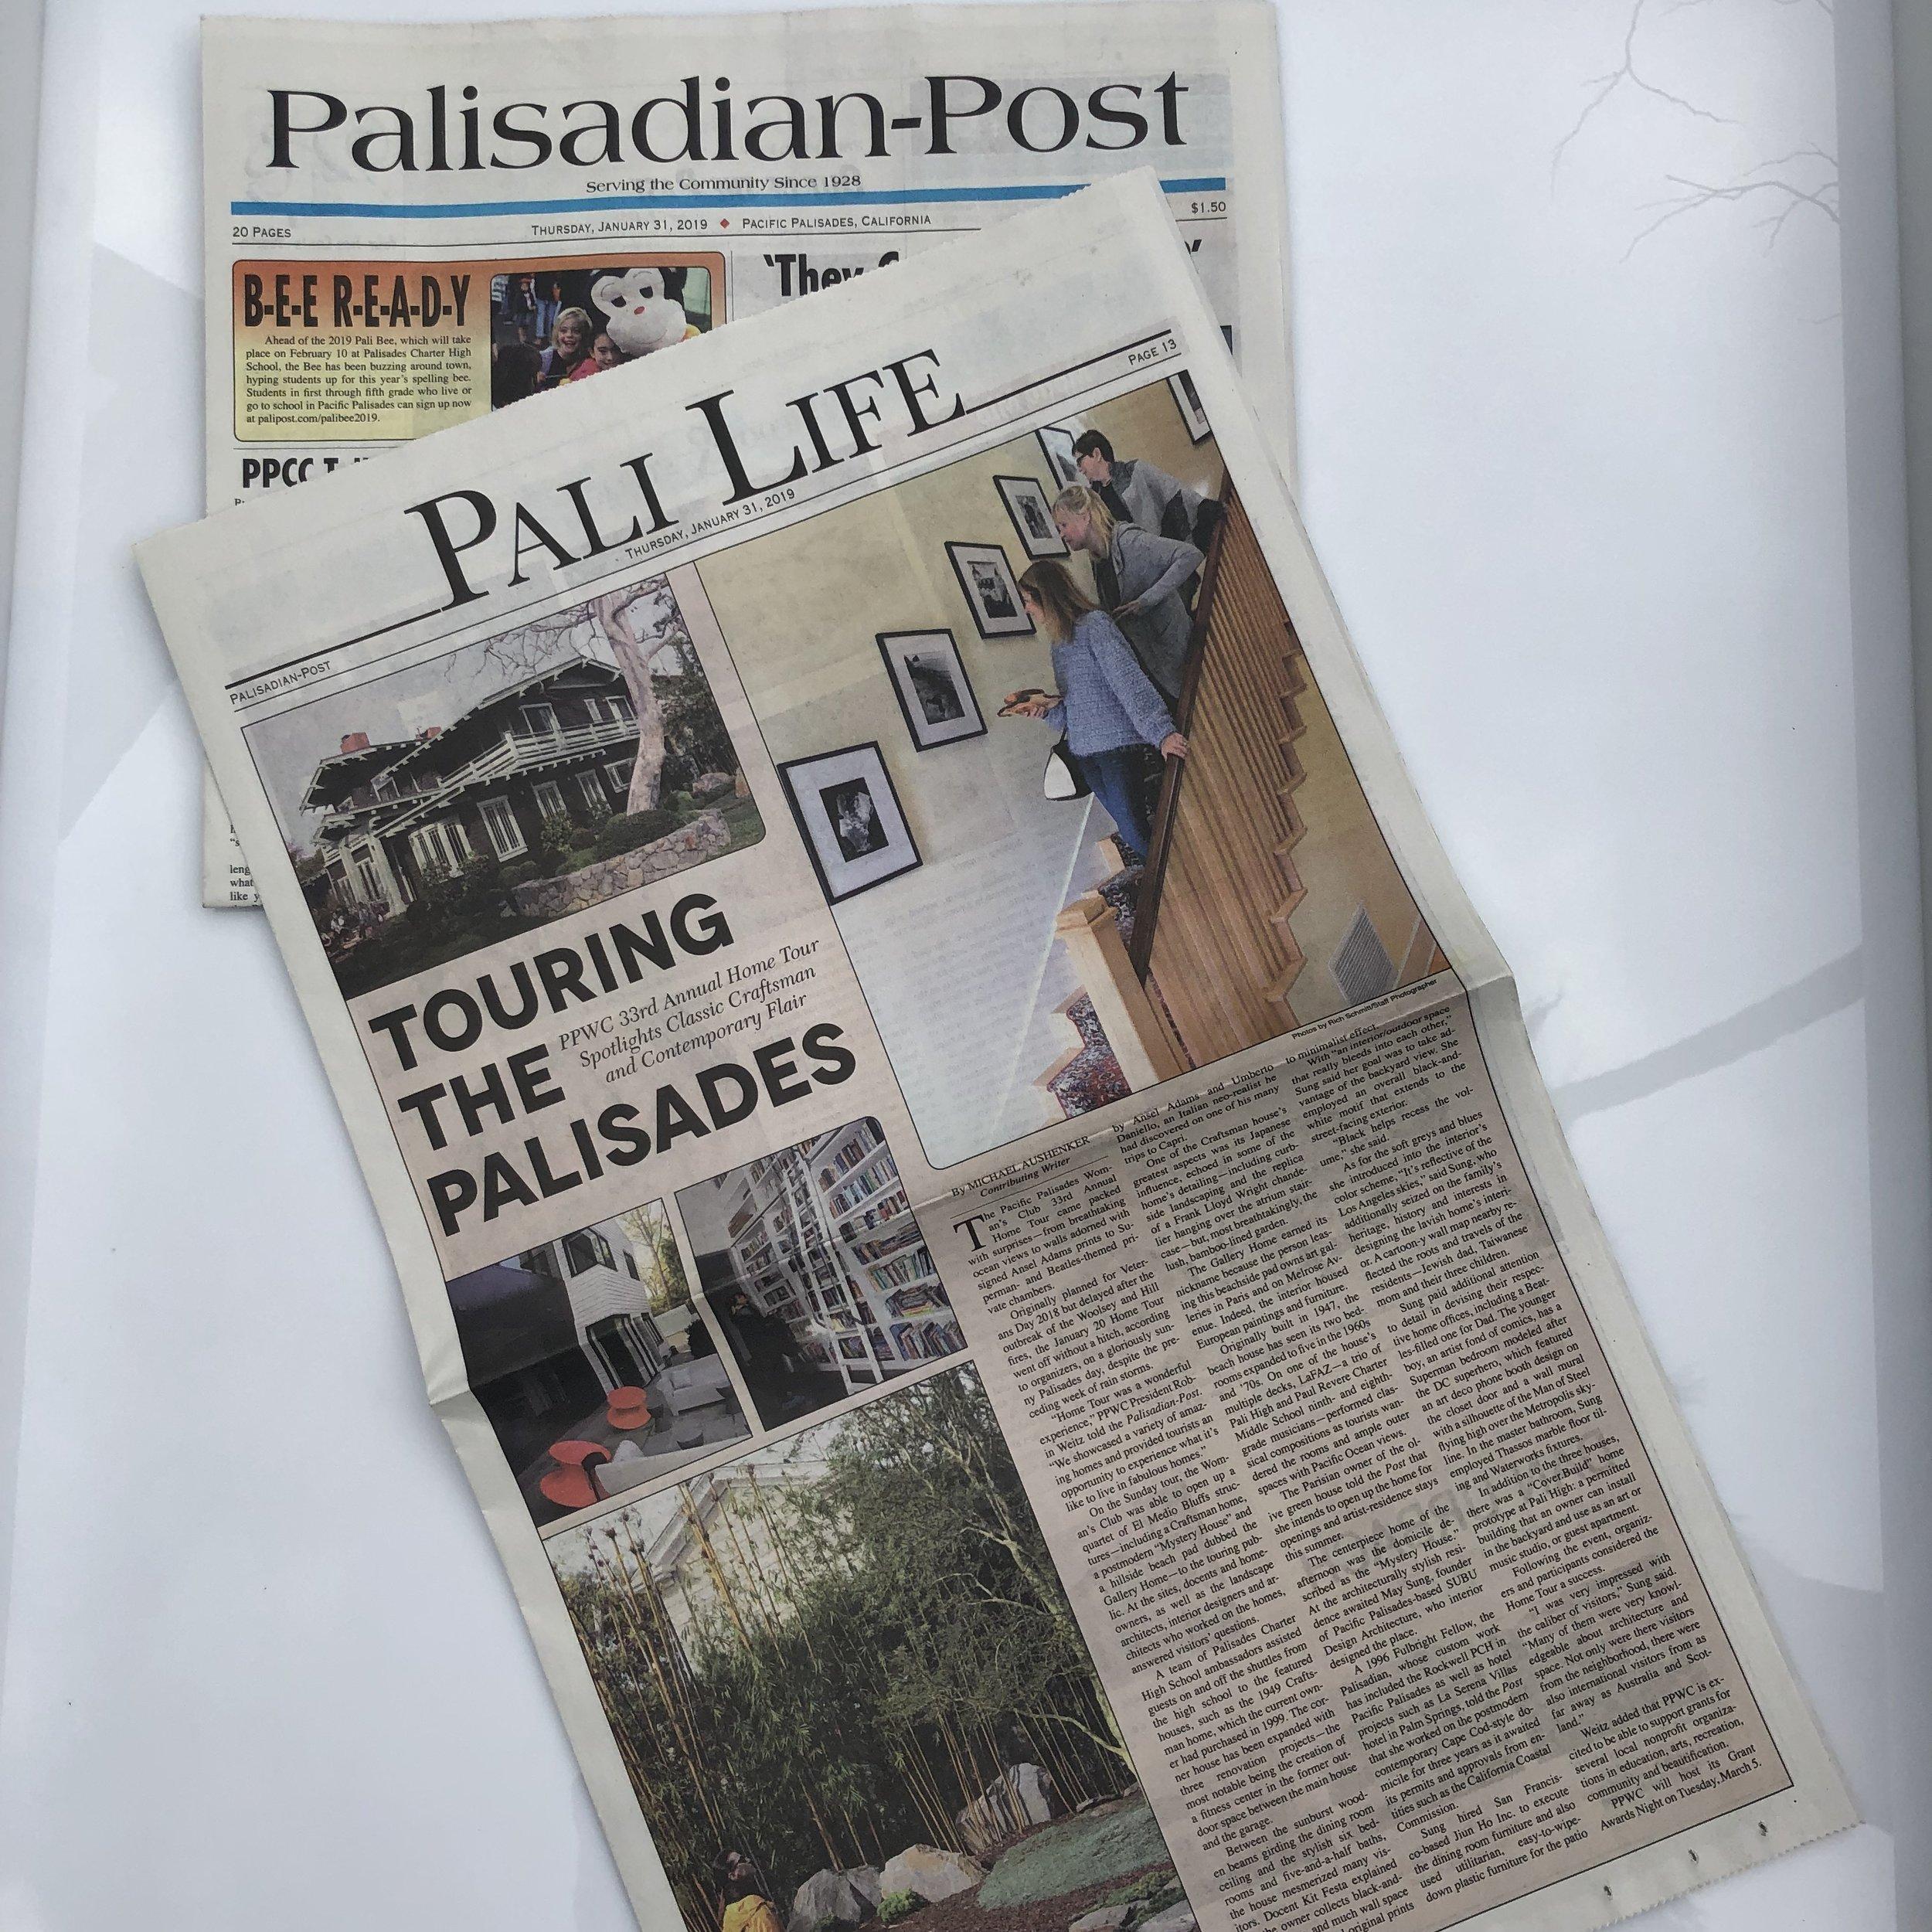 Palisadian-Post - January 31, 2019 - TOURING THE PALISADES